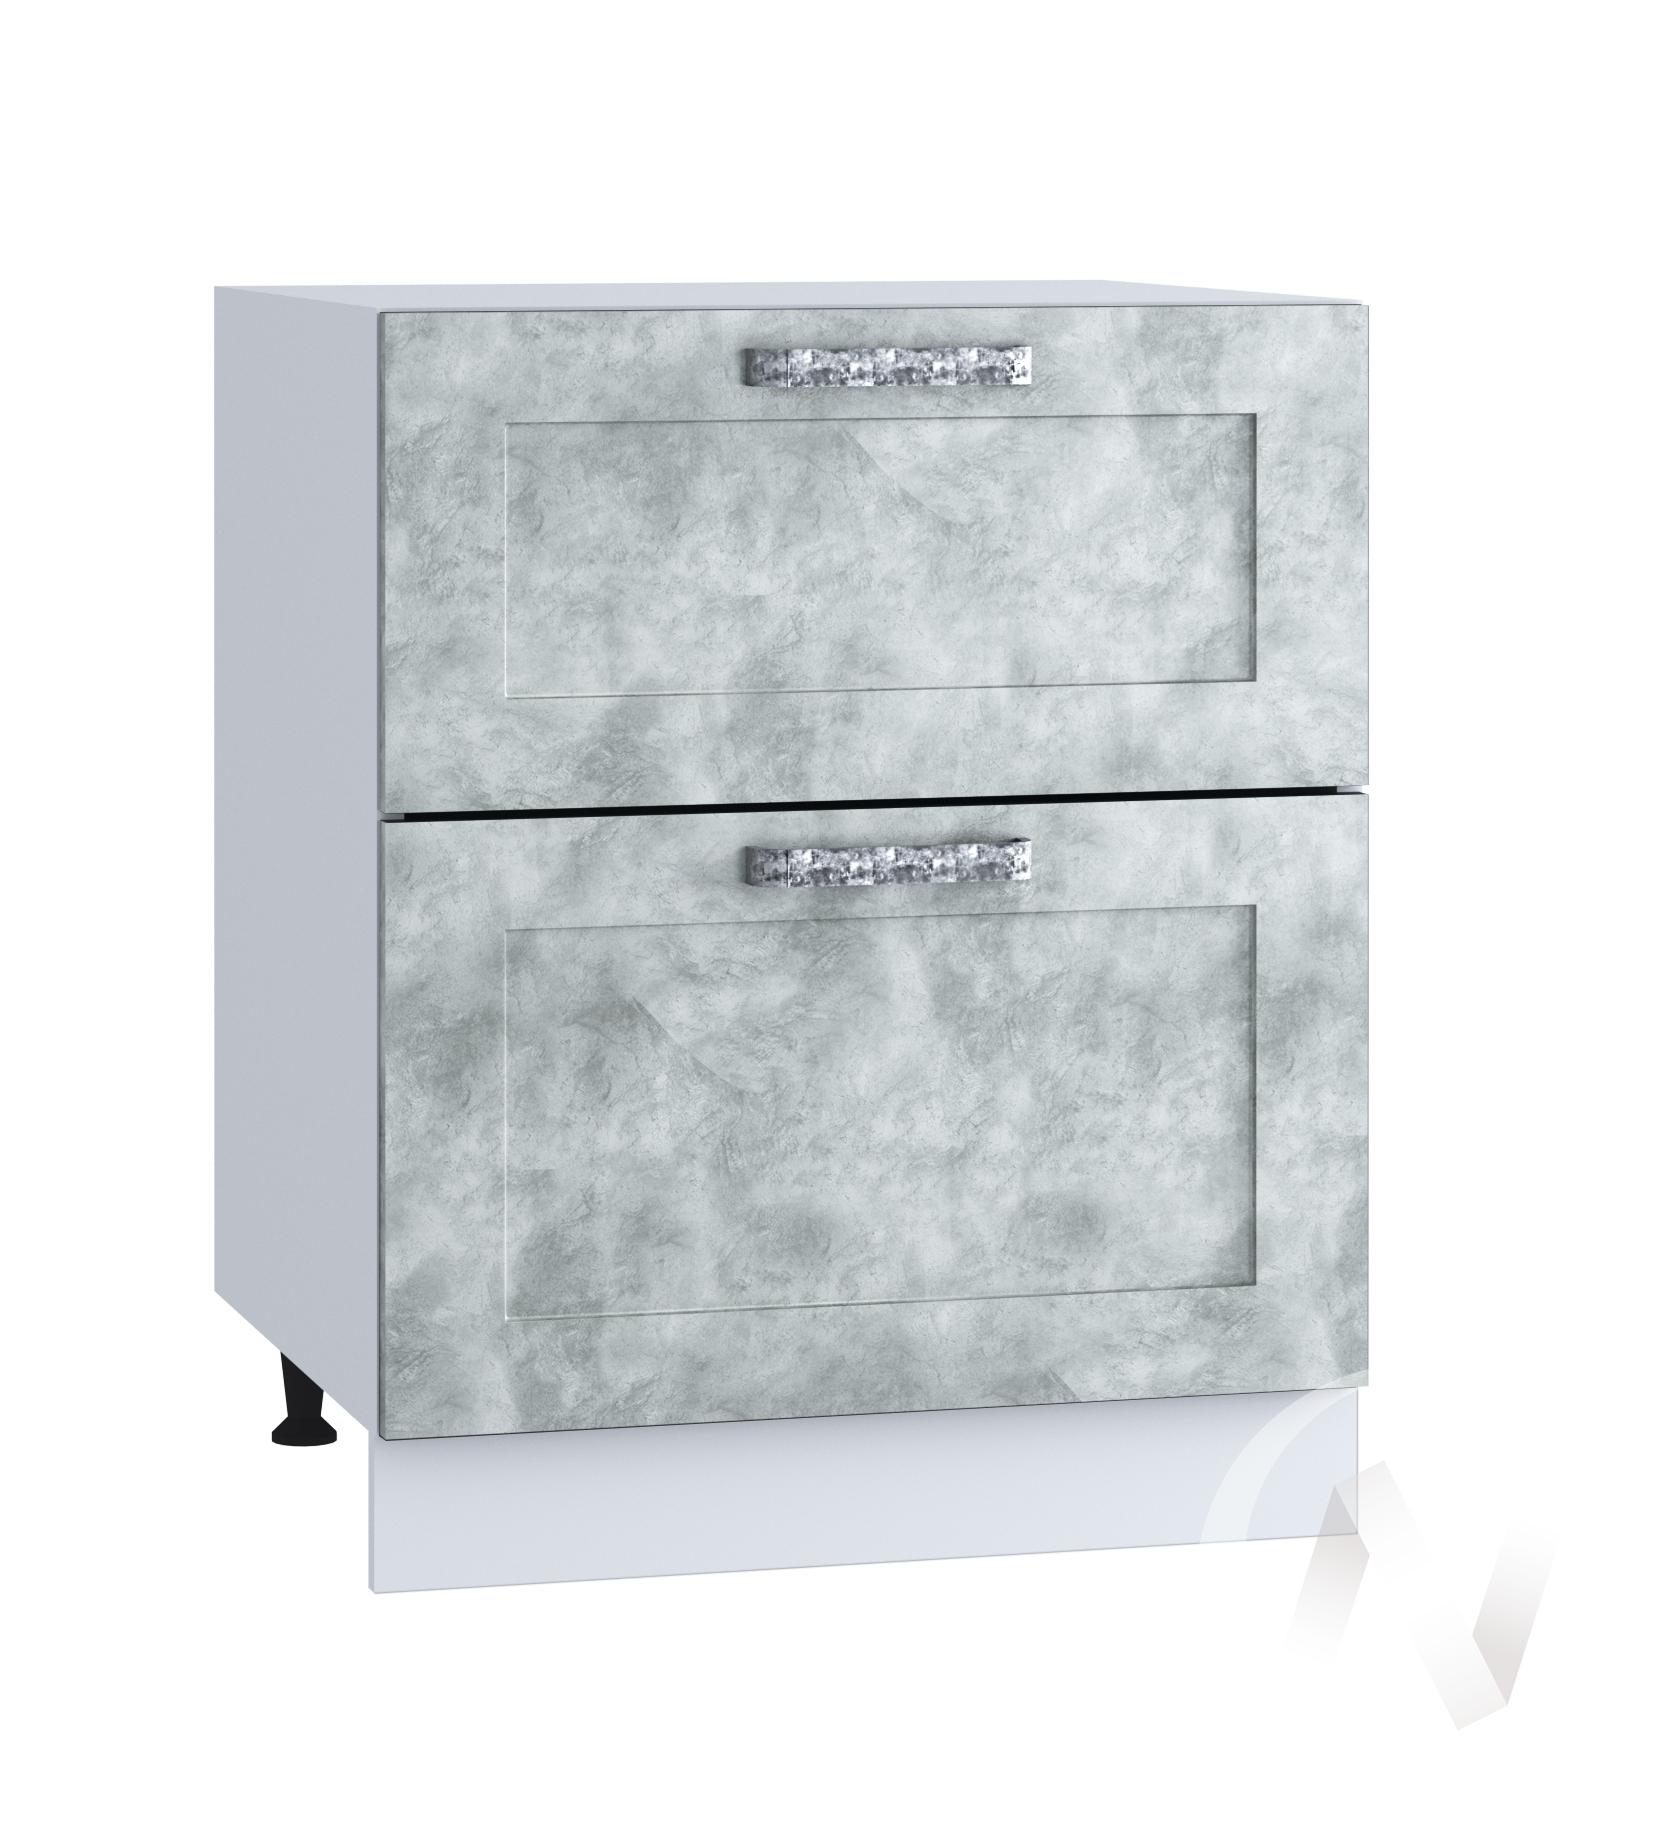 "Кухня ""Лофт"": Шкаф нижний с 2-мя ящиками 600, ШН2Я 600 (Бетон серый/корпус белый)"